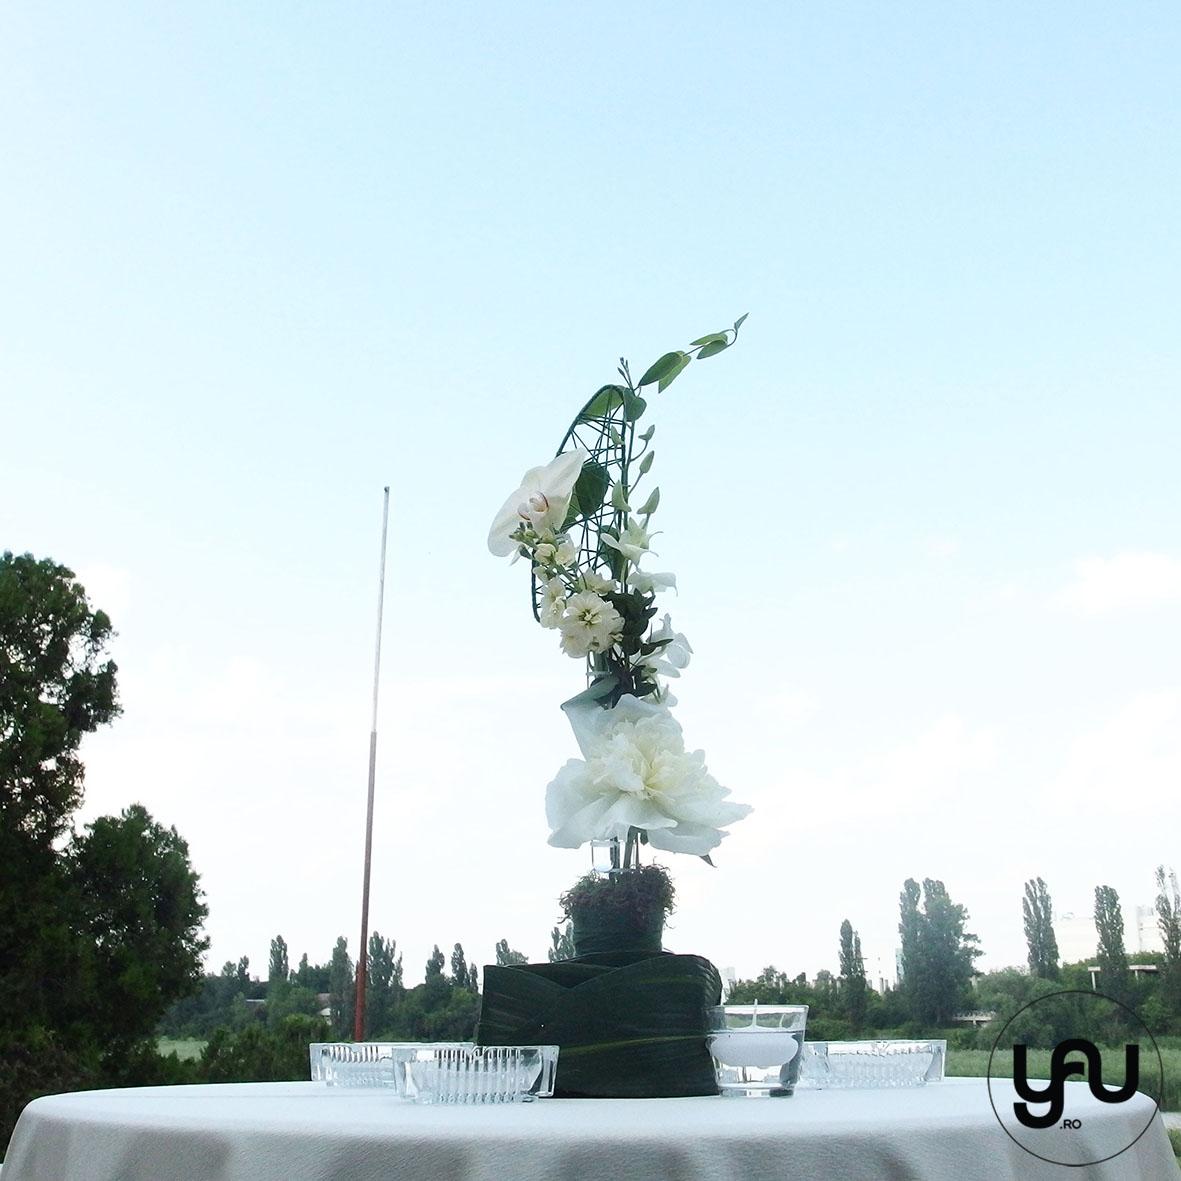 codrul-cu-flori-albe-bujori-mathiola-orhidee-_-yau-evenimente-2016-_-nunta-la-zexe-_-elenatoader-39